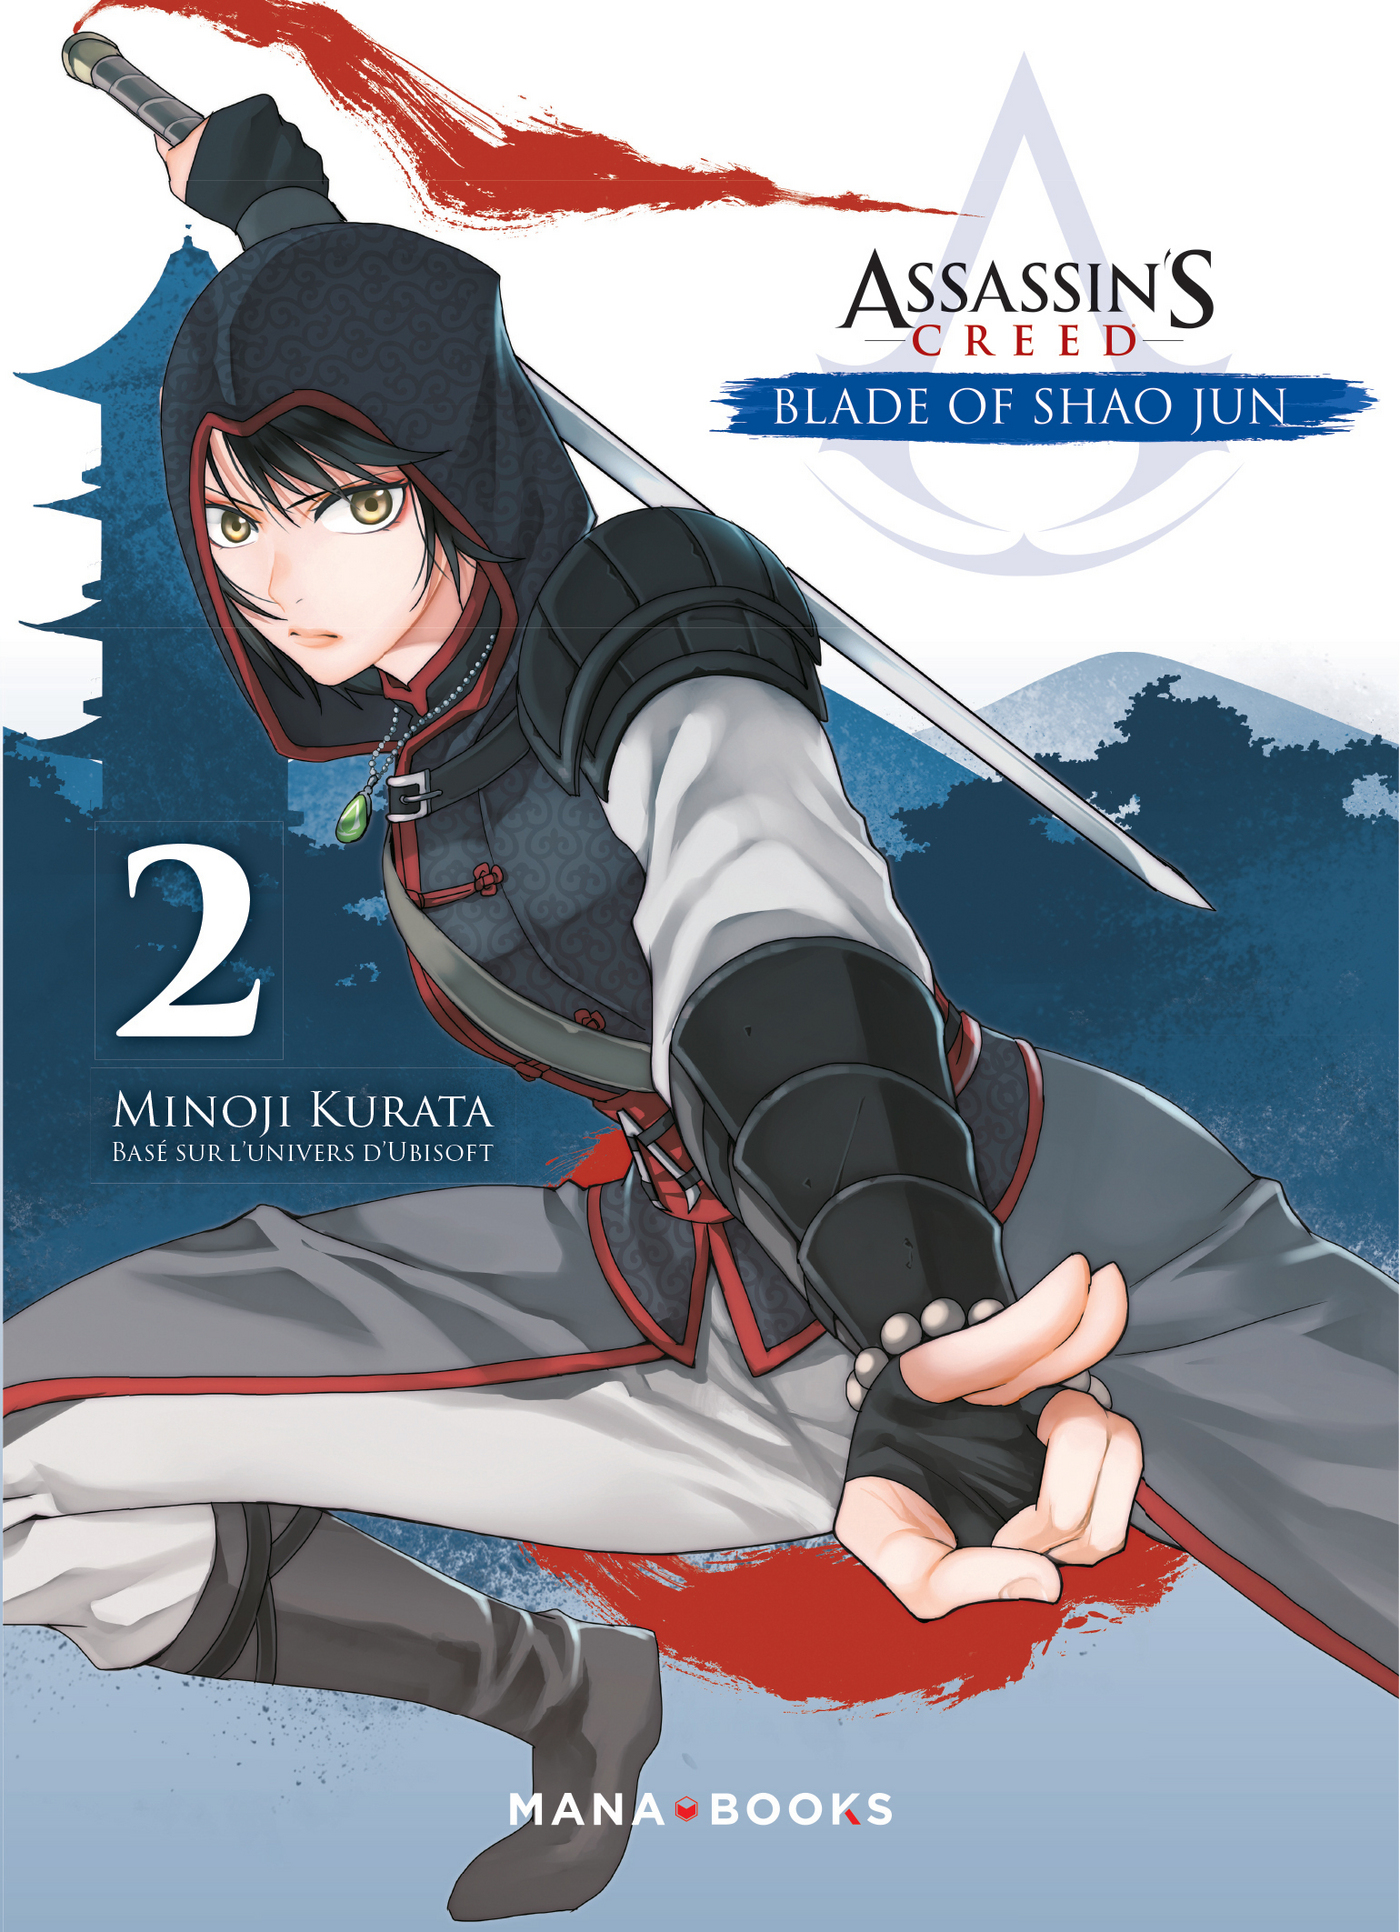 Assassin's Creed Blade of Shao Jun  2